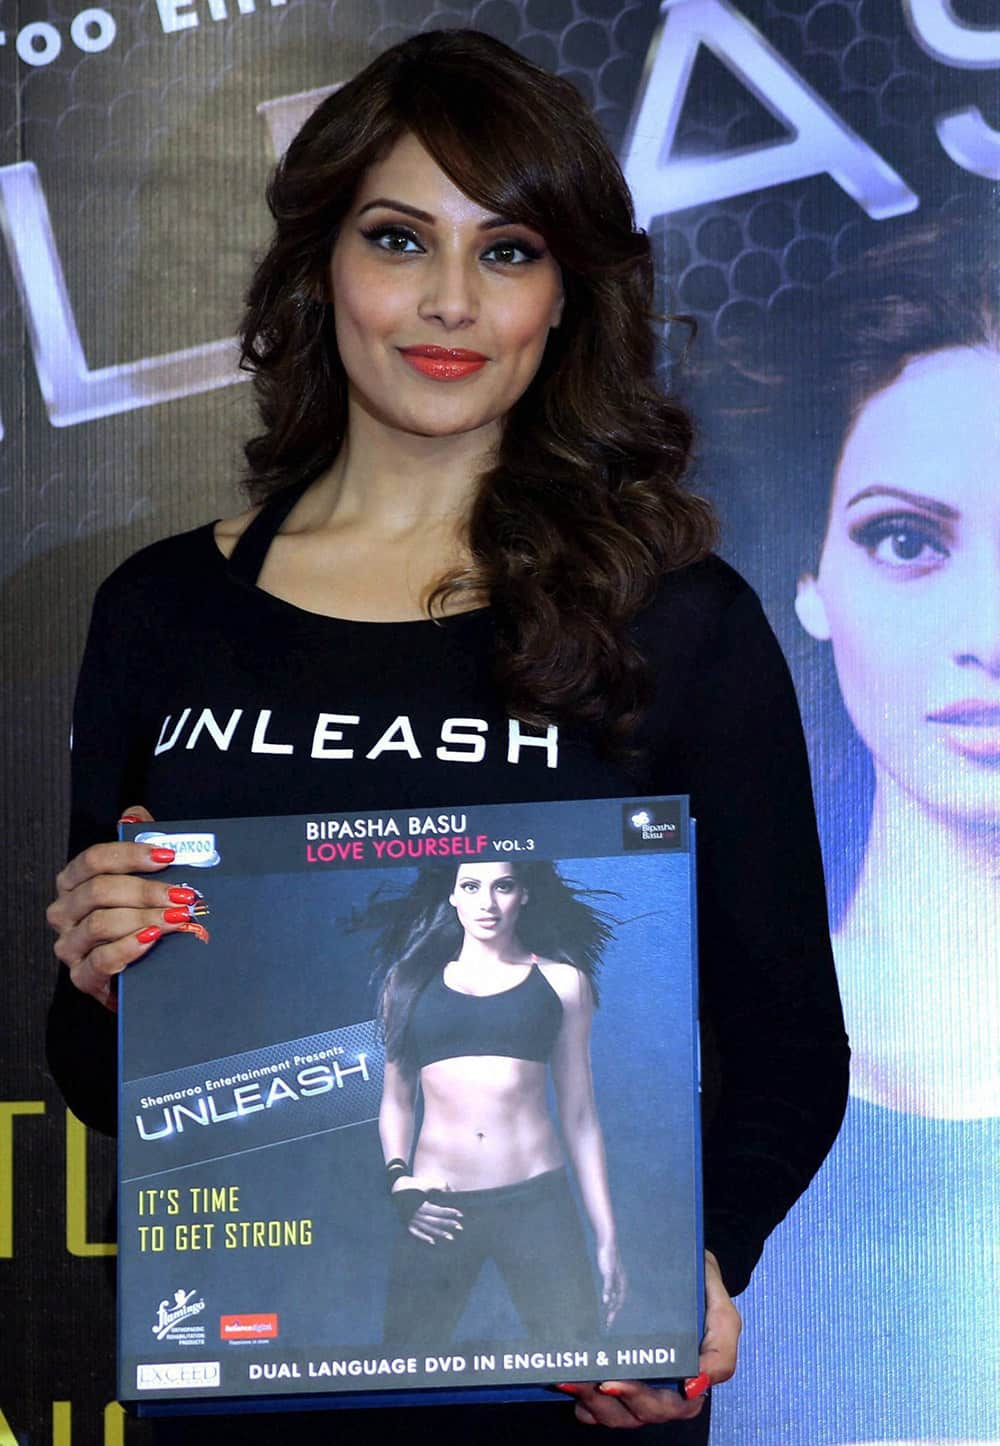 Bollywood actress Bipasha Basu at a release of her Fitness DVD in Mumbai.